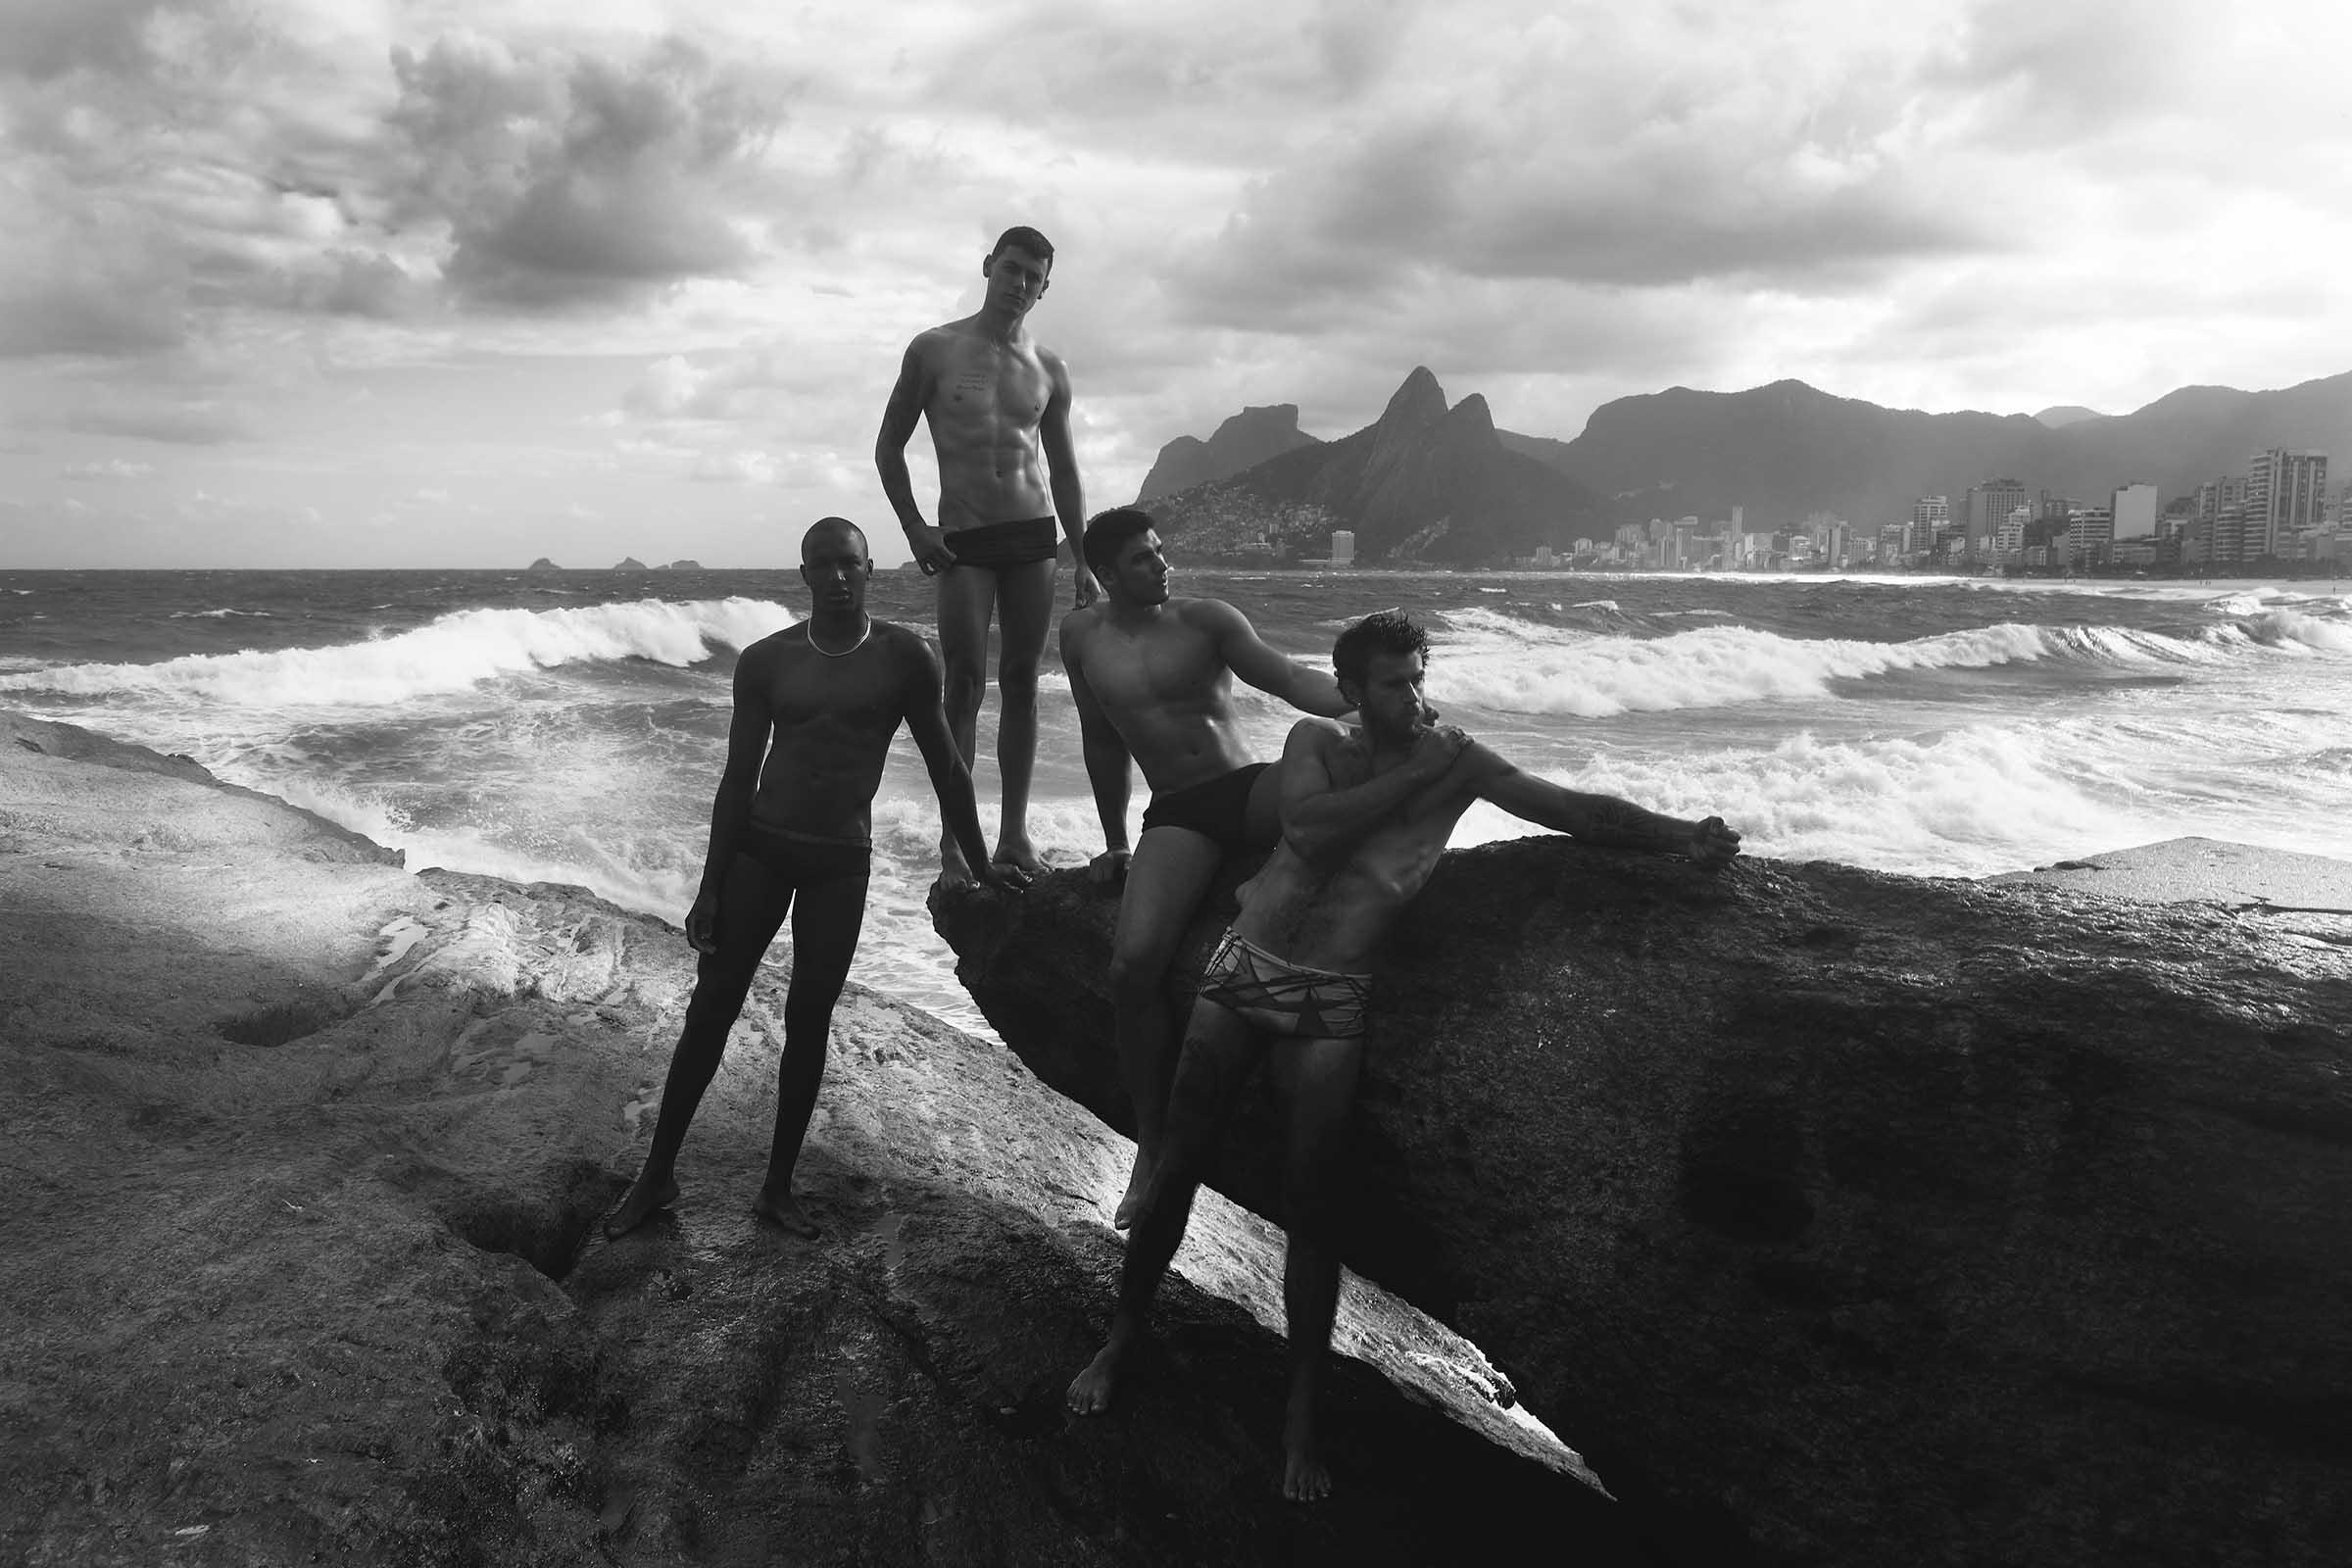 Joran Alcantara, Alan Oliver, Arturo de Cordova and Mateus Mattos by Filbert Kung for Brazilian Male Model